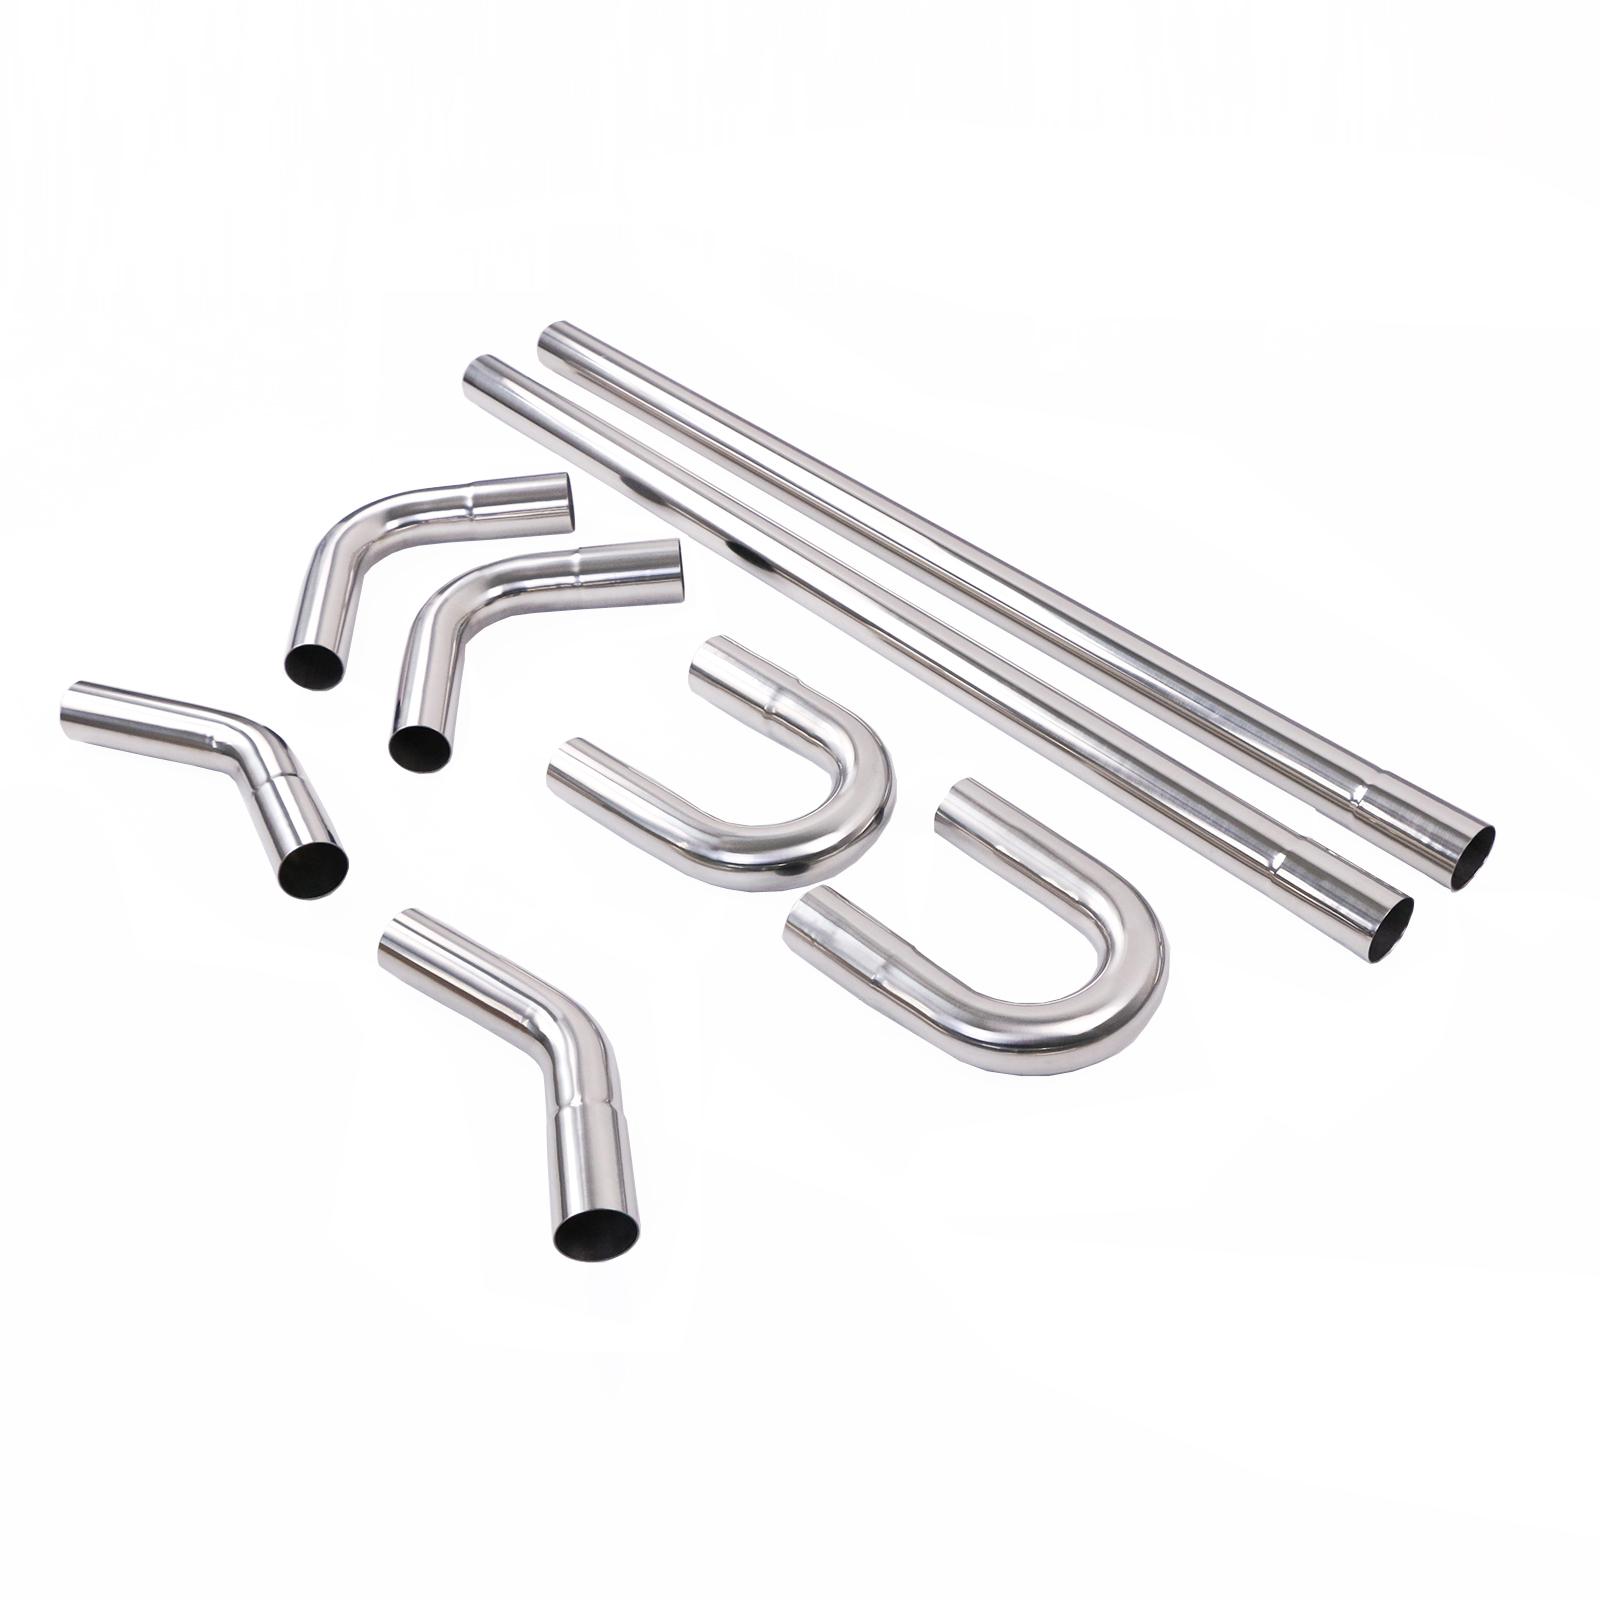 3 inch t304 stainless steel diy custom mandrel exhaust pipe straight bend kit buy mandrel bends 3 inch mandrel bent pipes and bend kit 2 5 mandrel